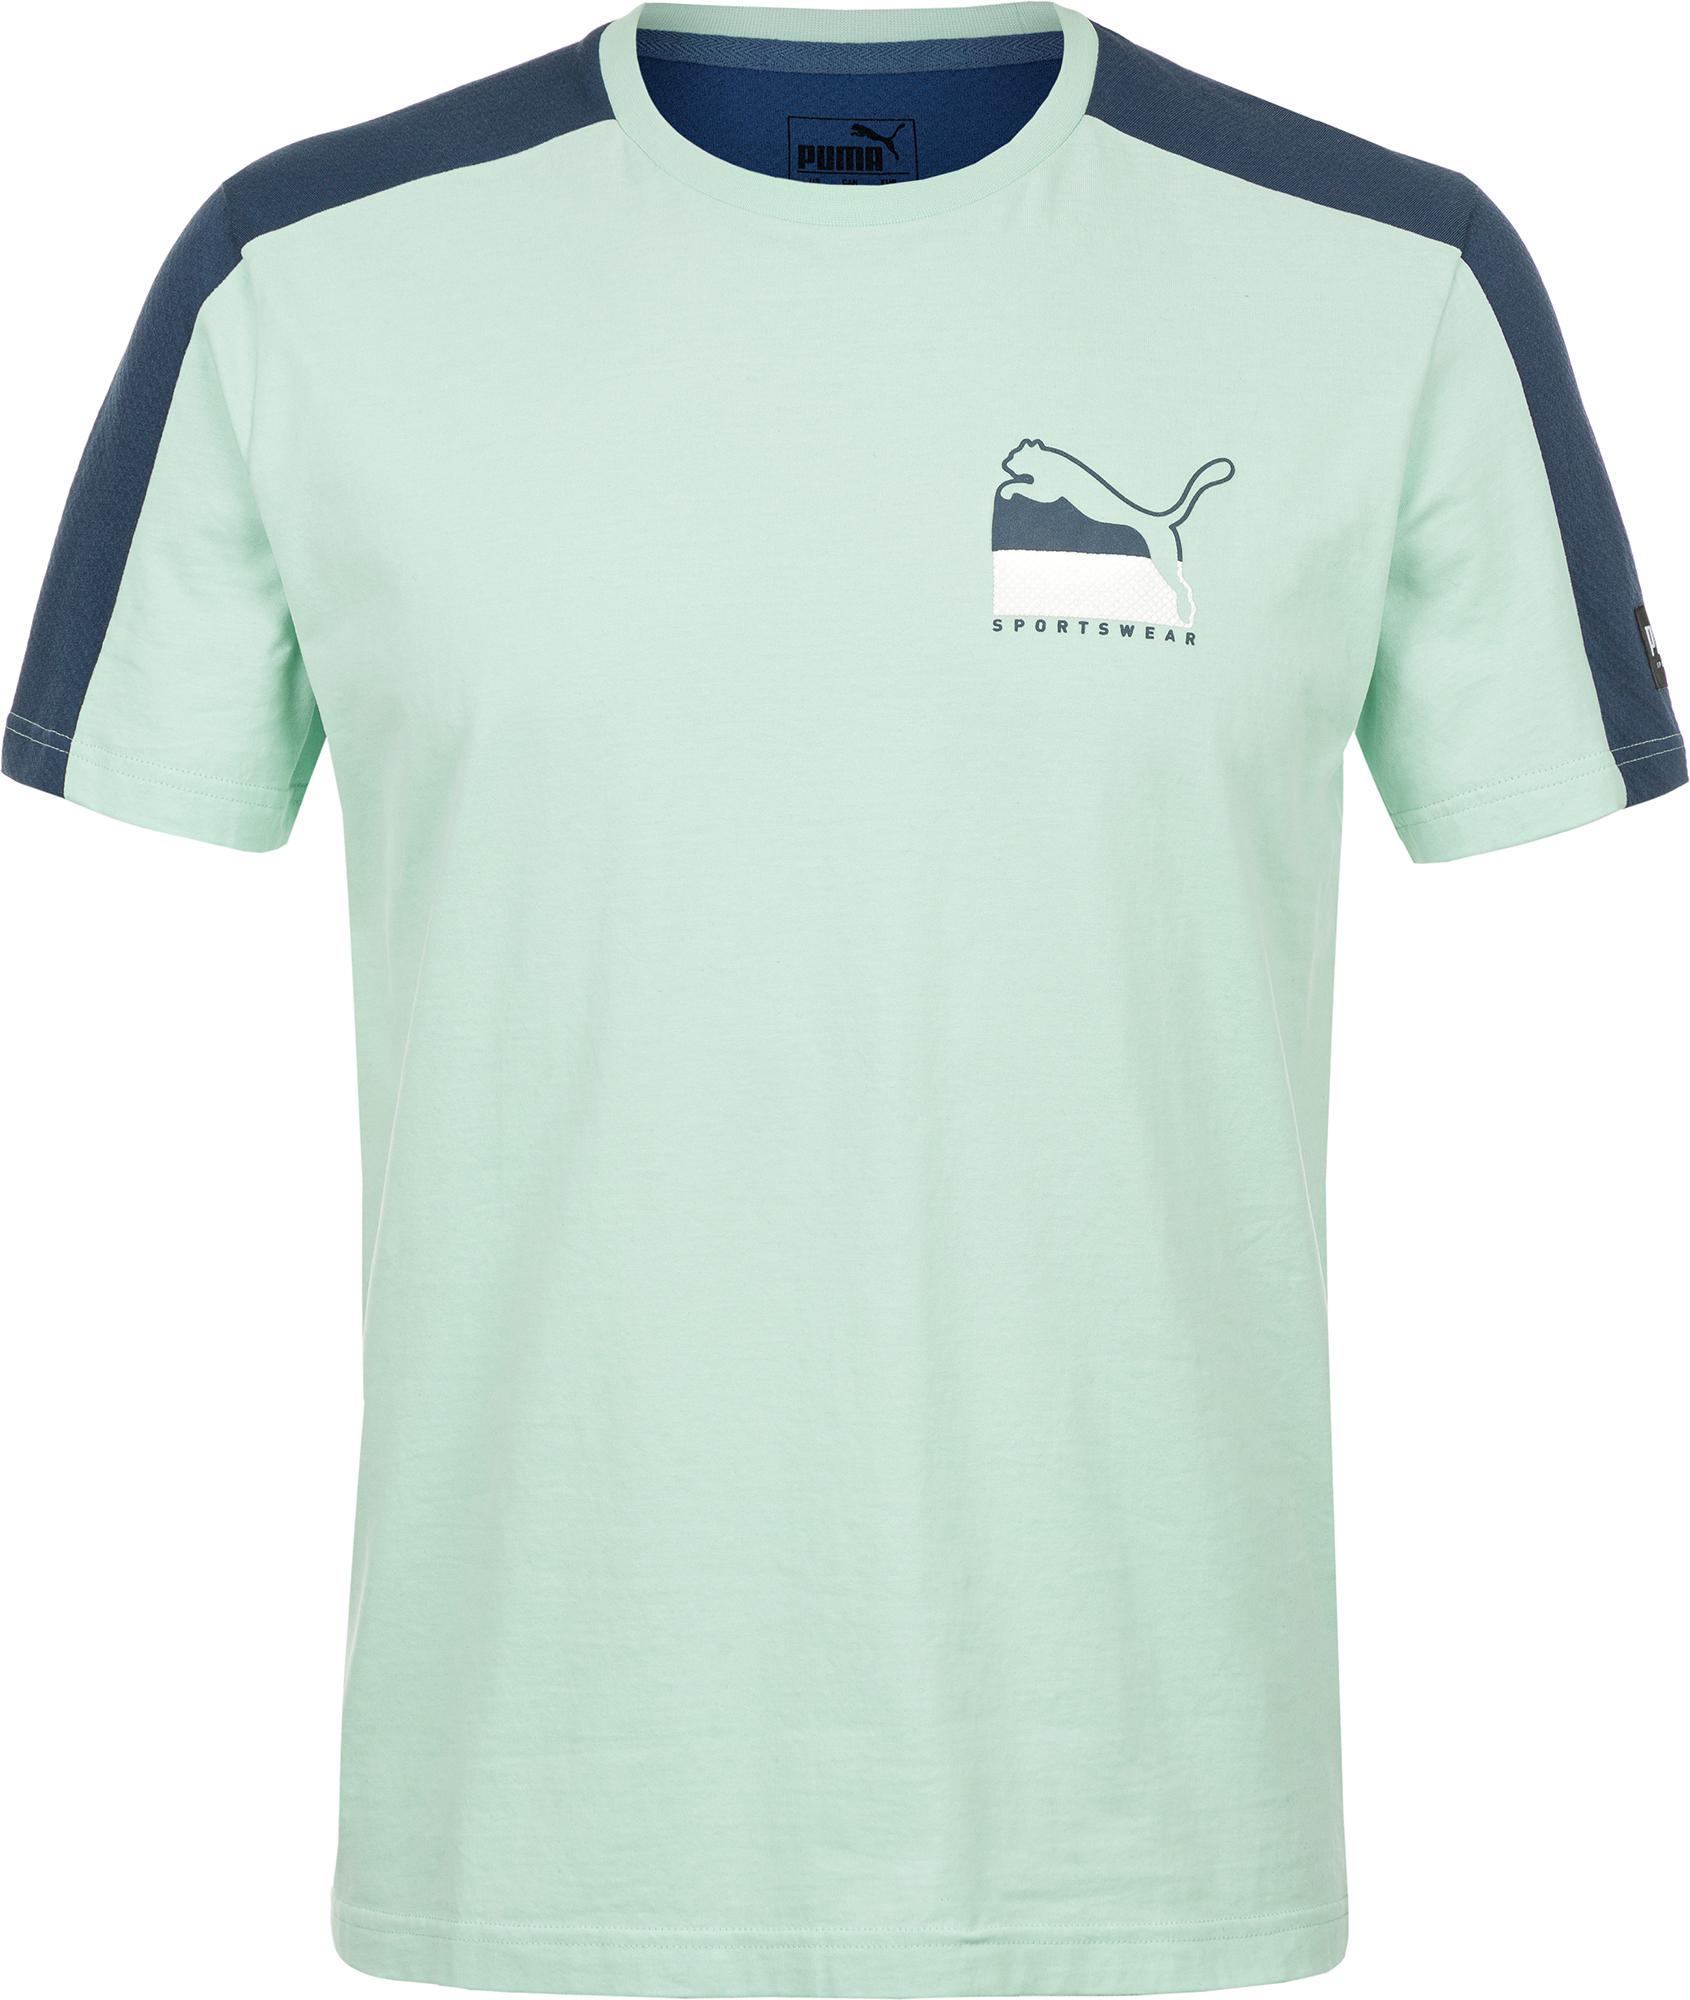 Puma Футболка мужская Puma ATHLETICS Advanced Tee, размер 46-48 puma футболка мужская puma aop split tee размер 48 50